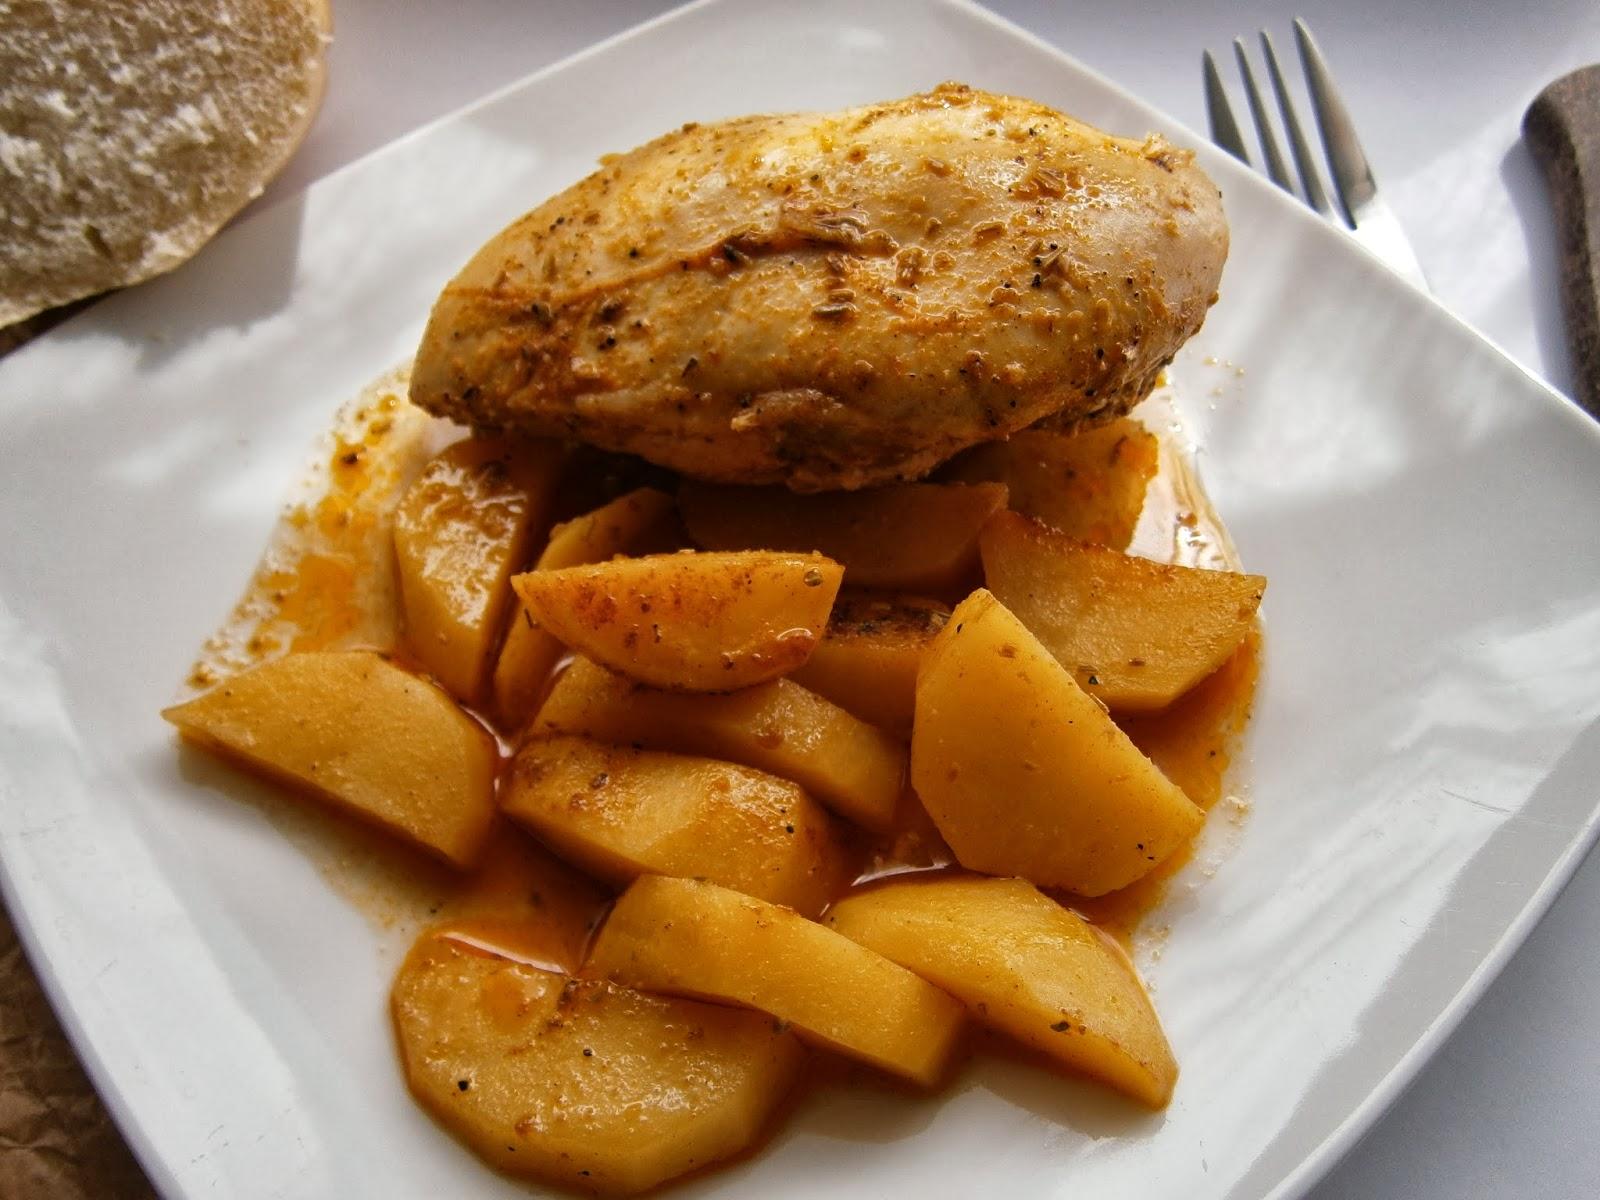 Quitahambres pollo adobado al horno con papas - Pechugas de pollo al horno con patatas ...